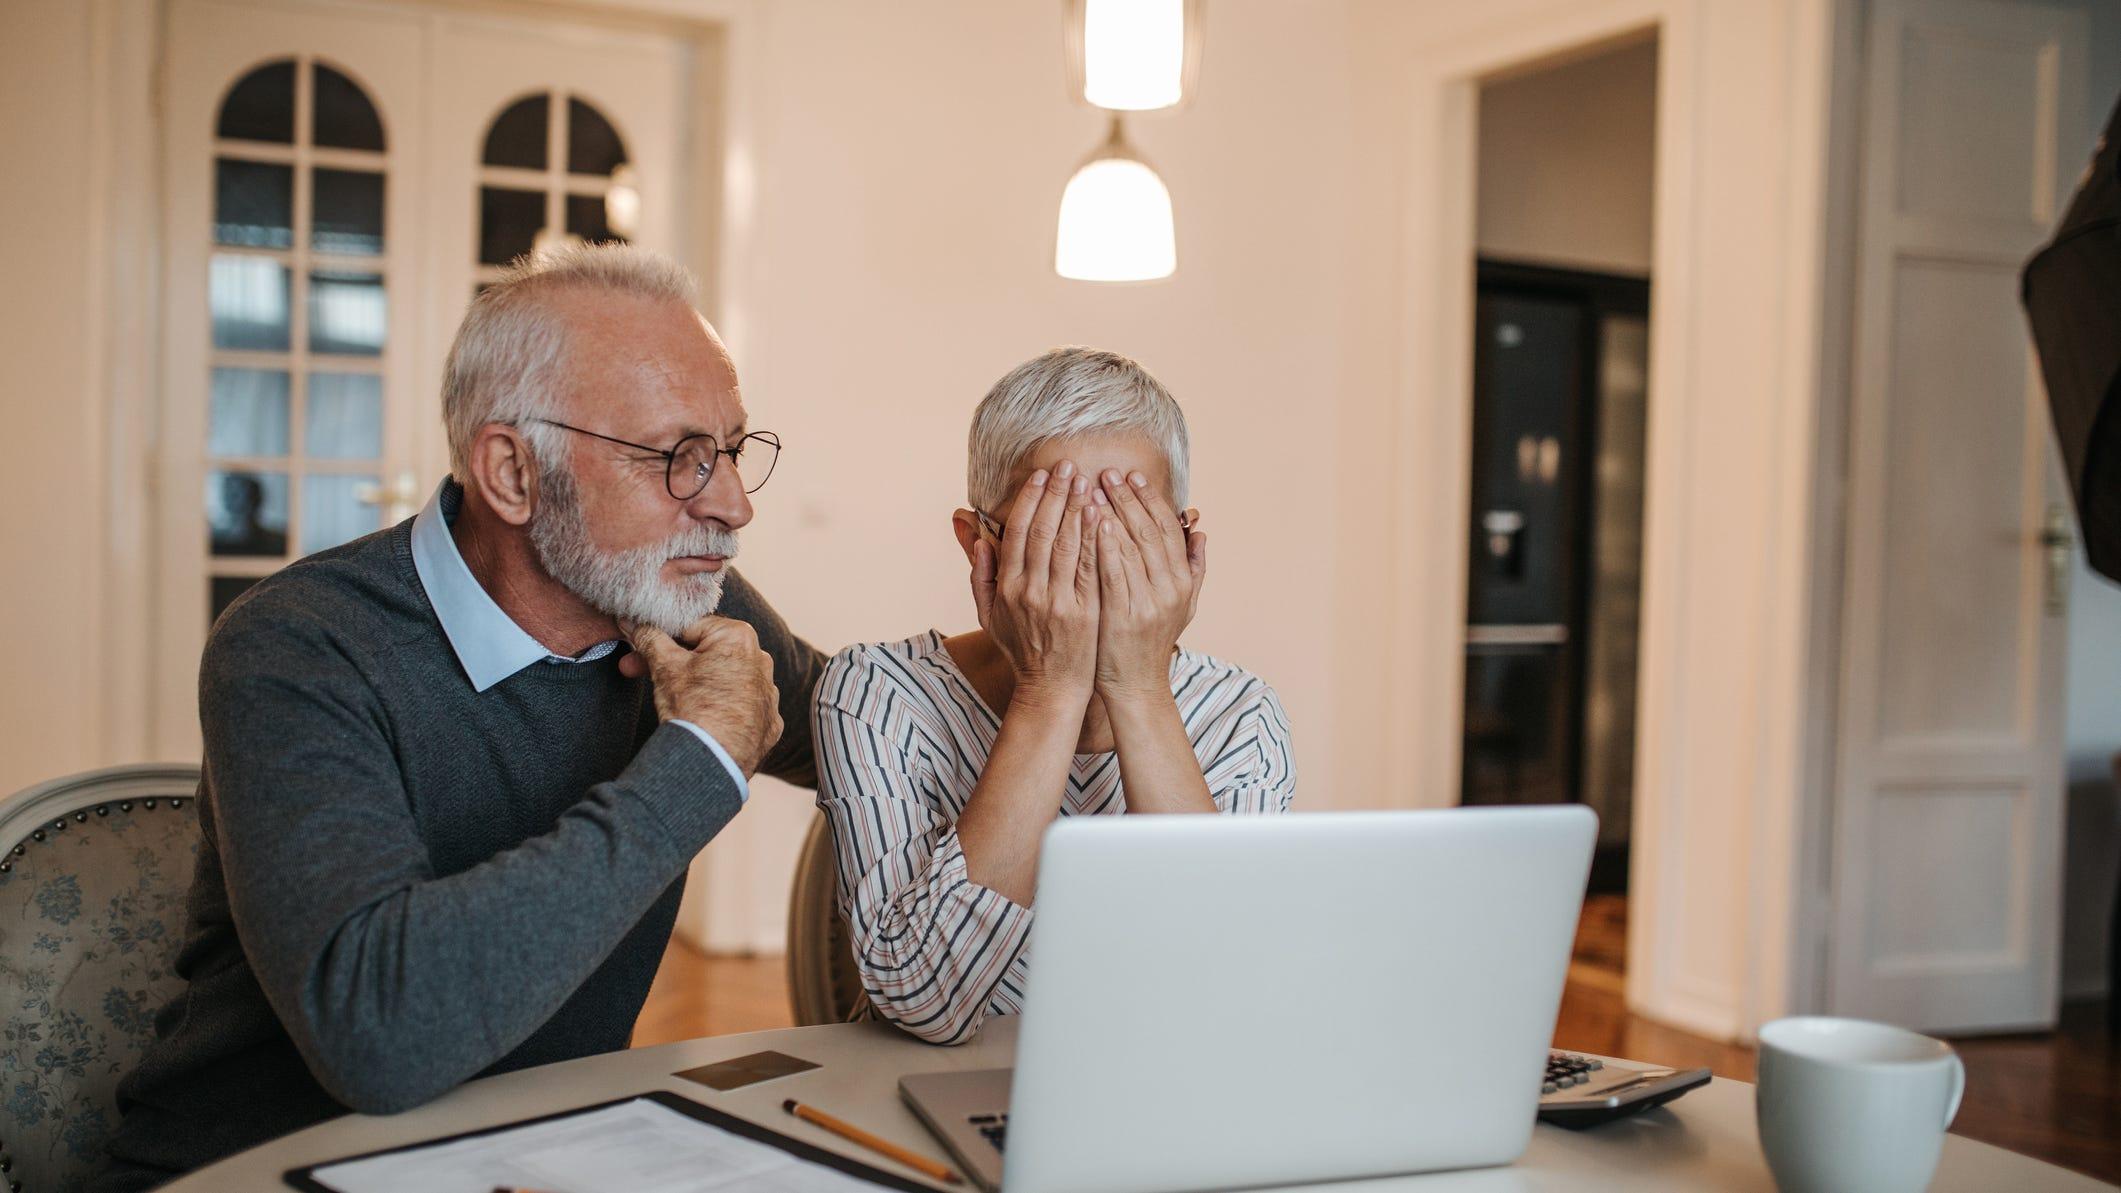 These 3 dangerous Social Security myths could destroy your retirement